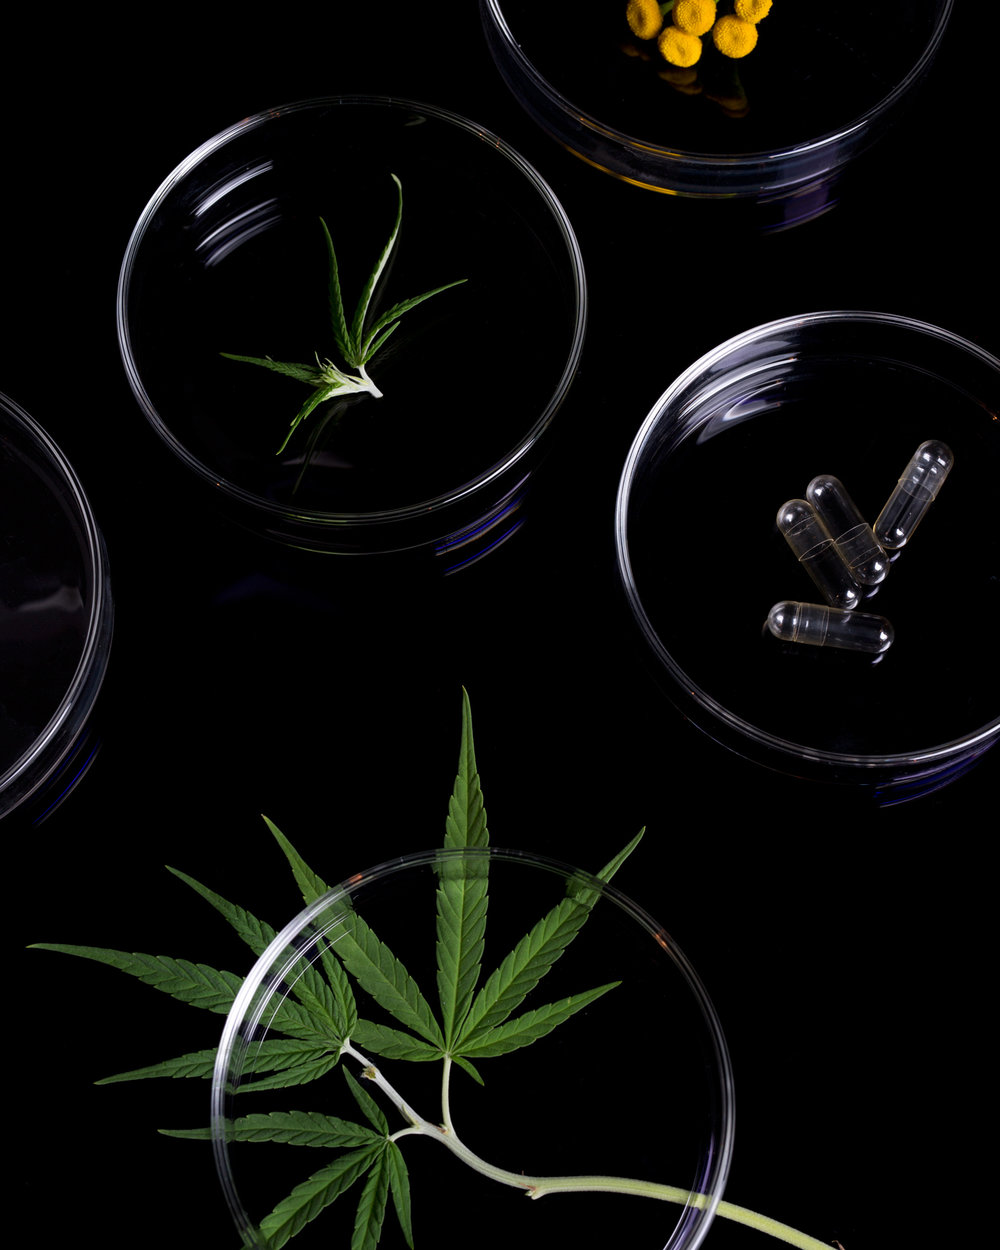 Hail Mary — Cannabis-based alternatives to medicine. Carolyn Gregoire interviews Mary's Nutritionals CEO Lynn Honderd.